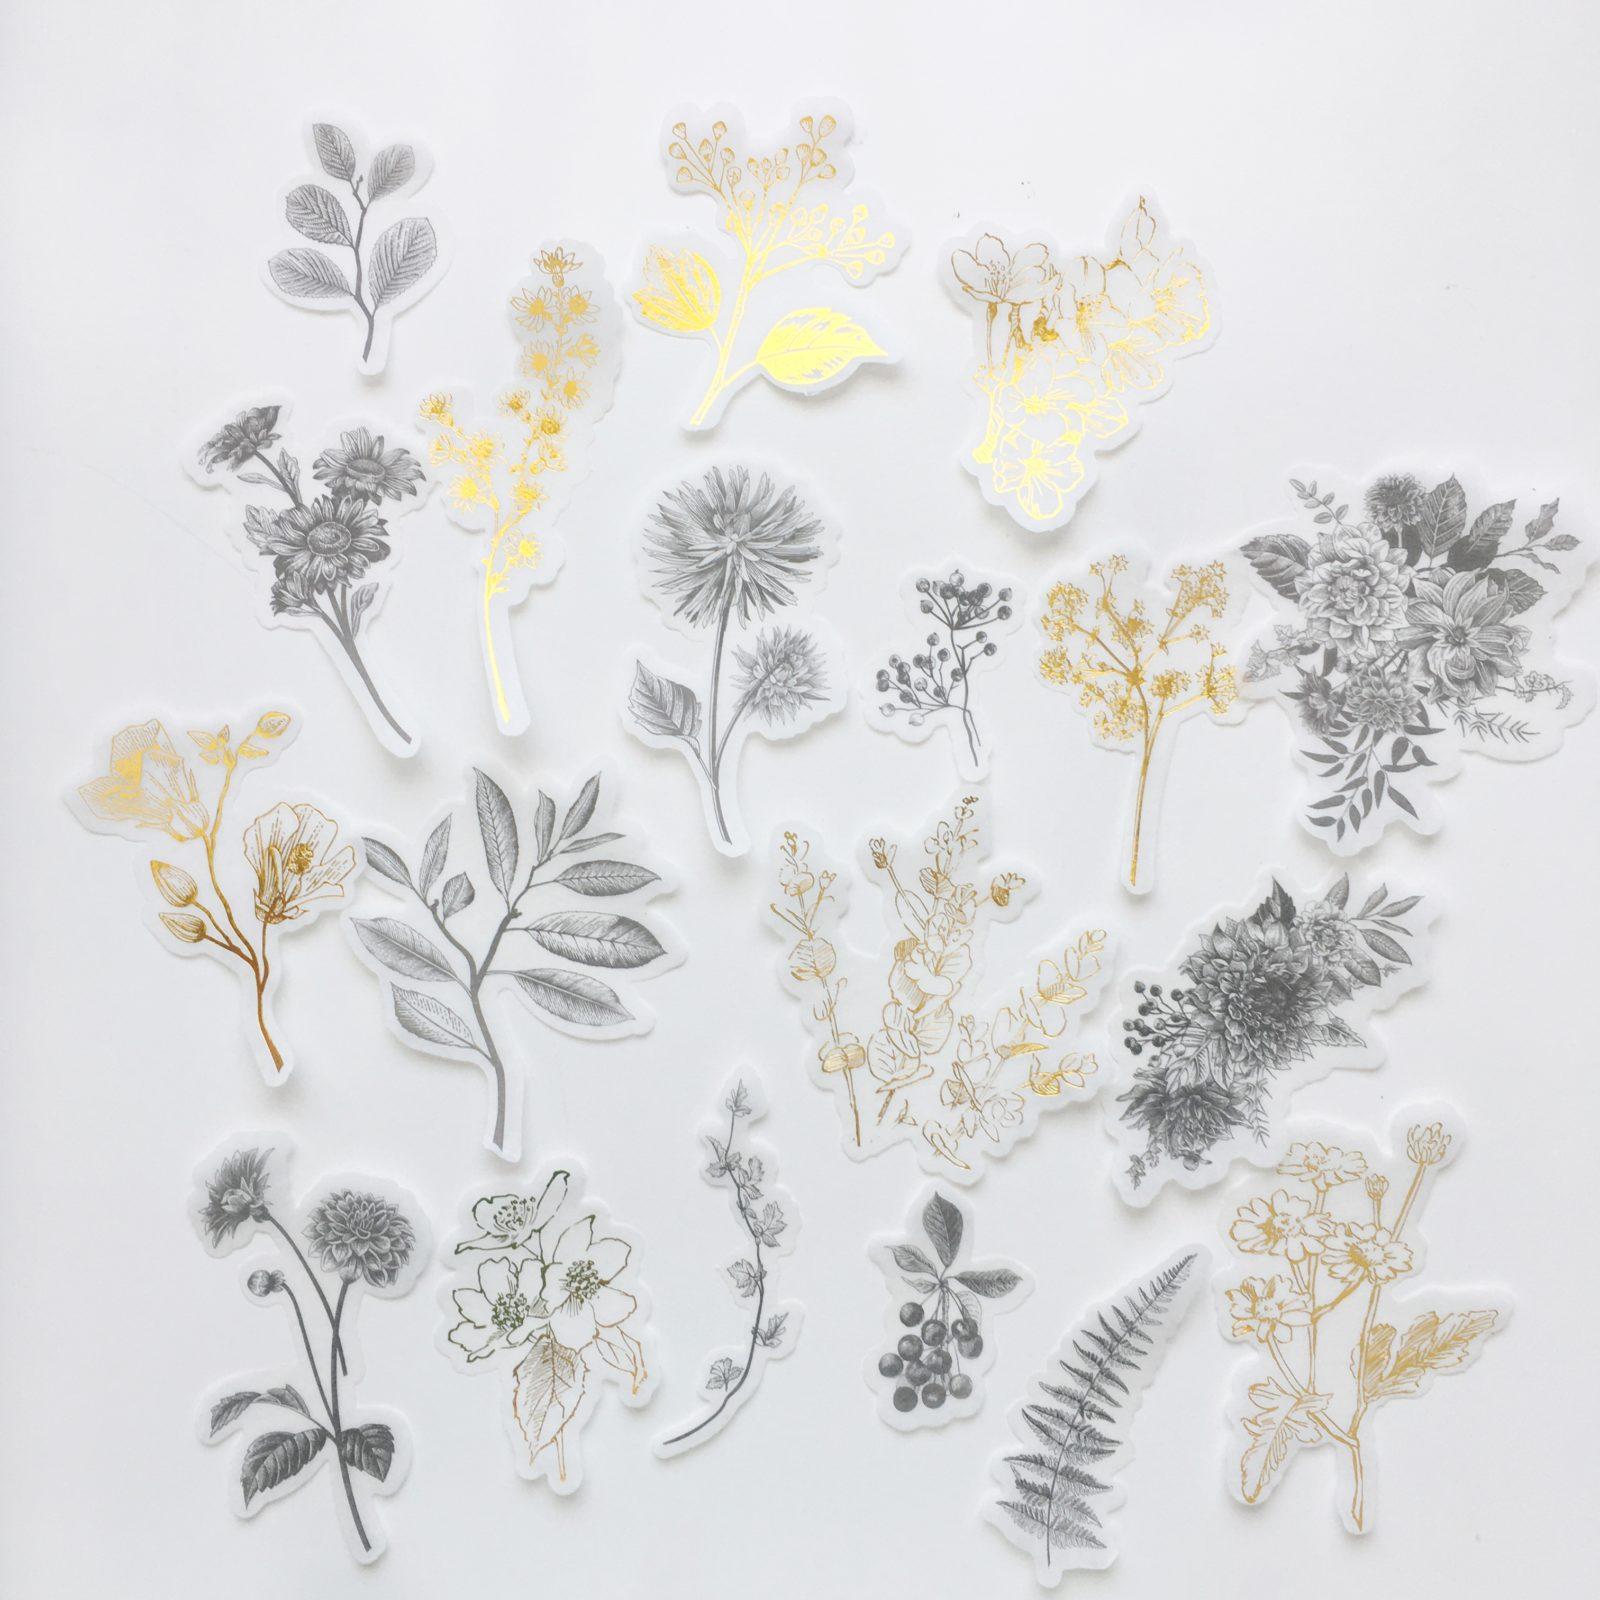 Flora sticker set - Goud en Zwart - Bloemen